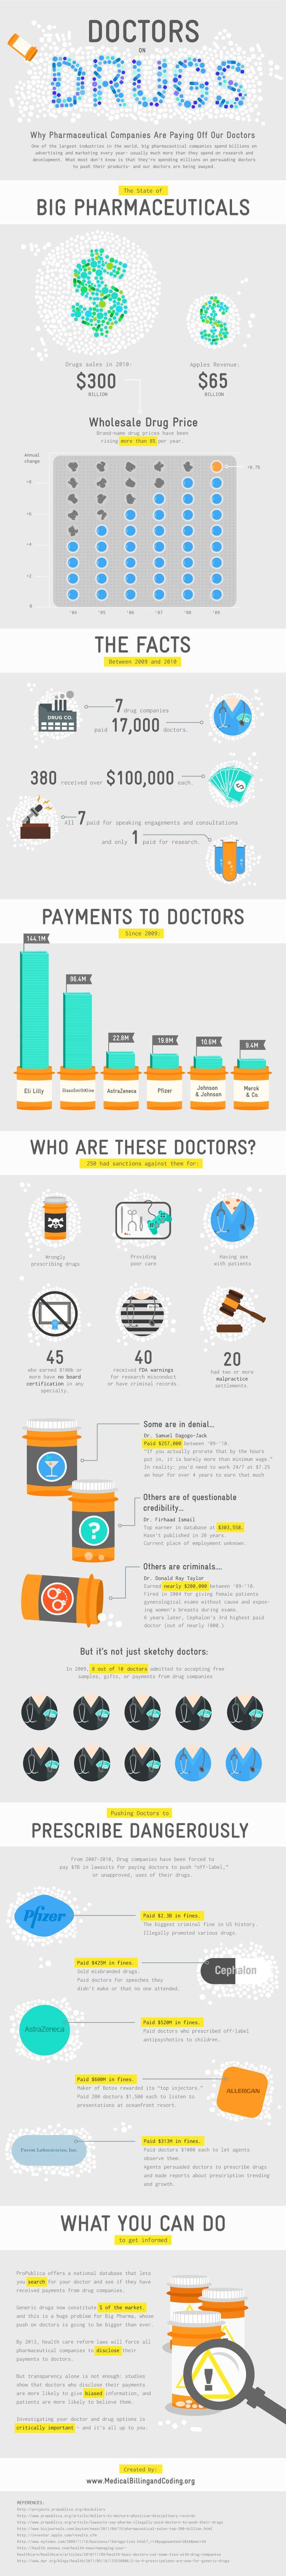 Doctors on Drugs